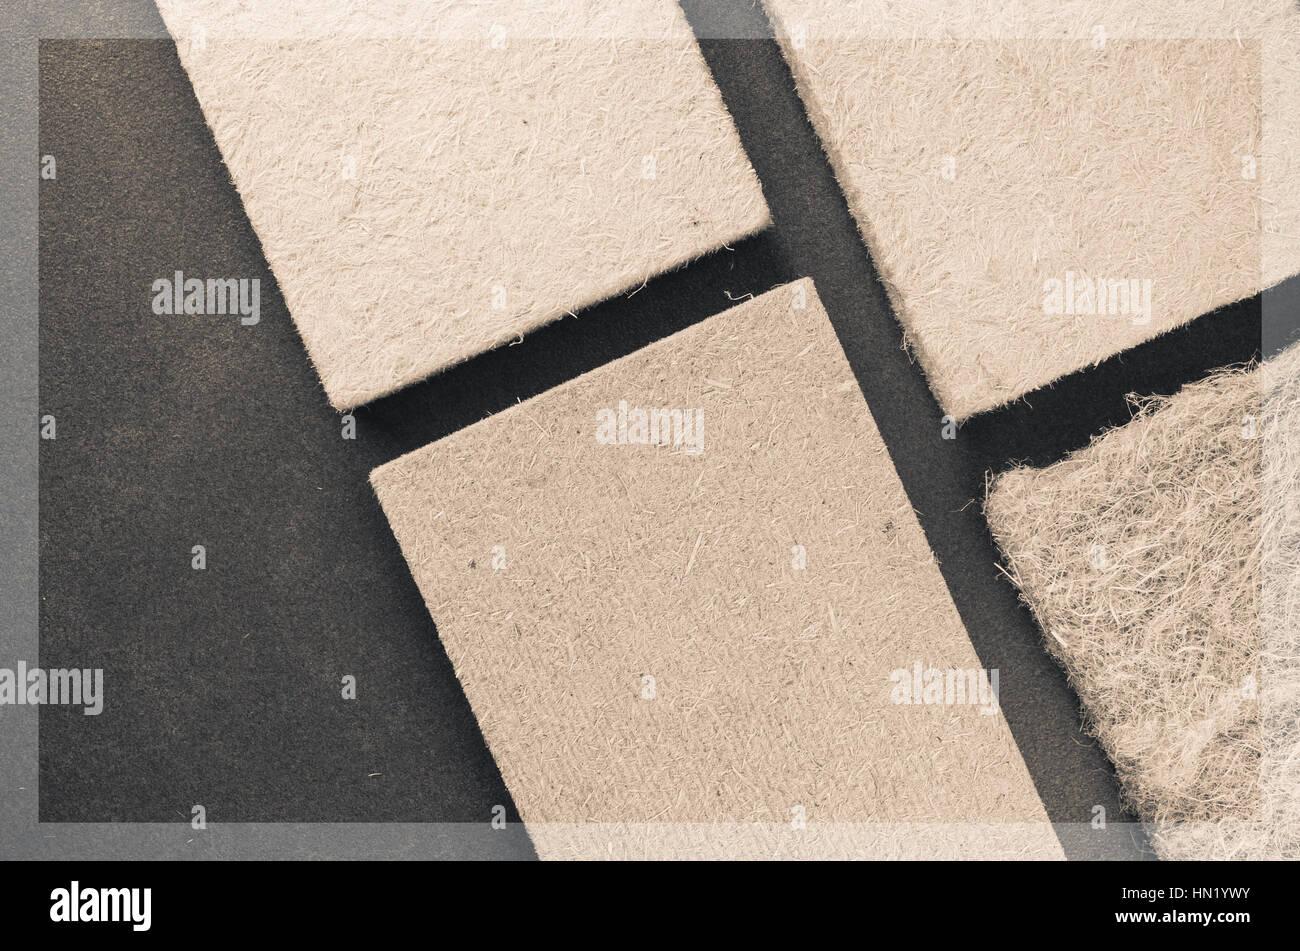 compressed thermal insulating hemp fiber panels - raw industrial materials - Stock Image